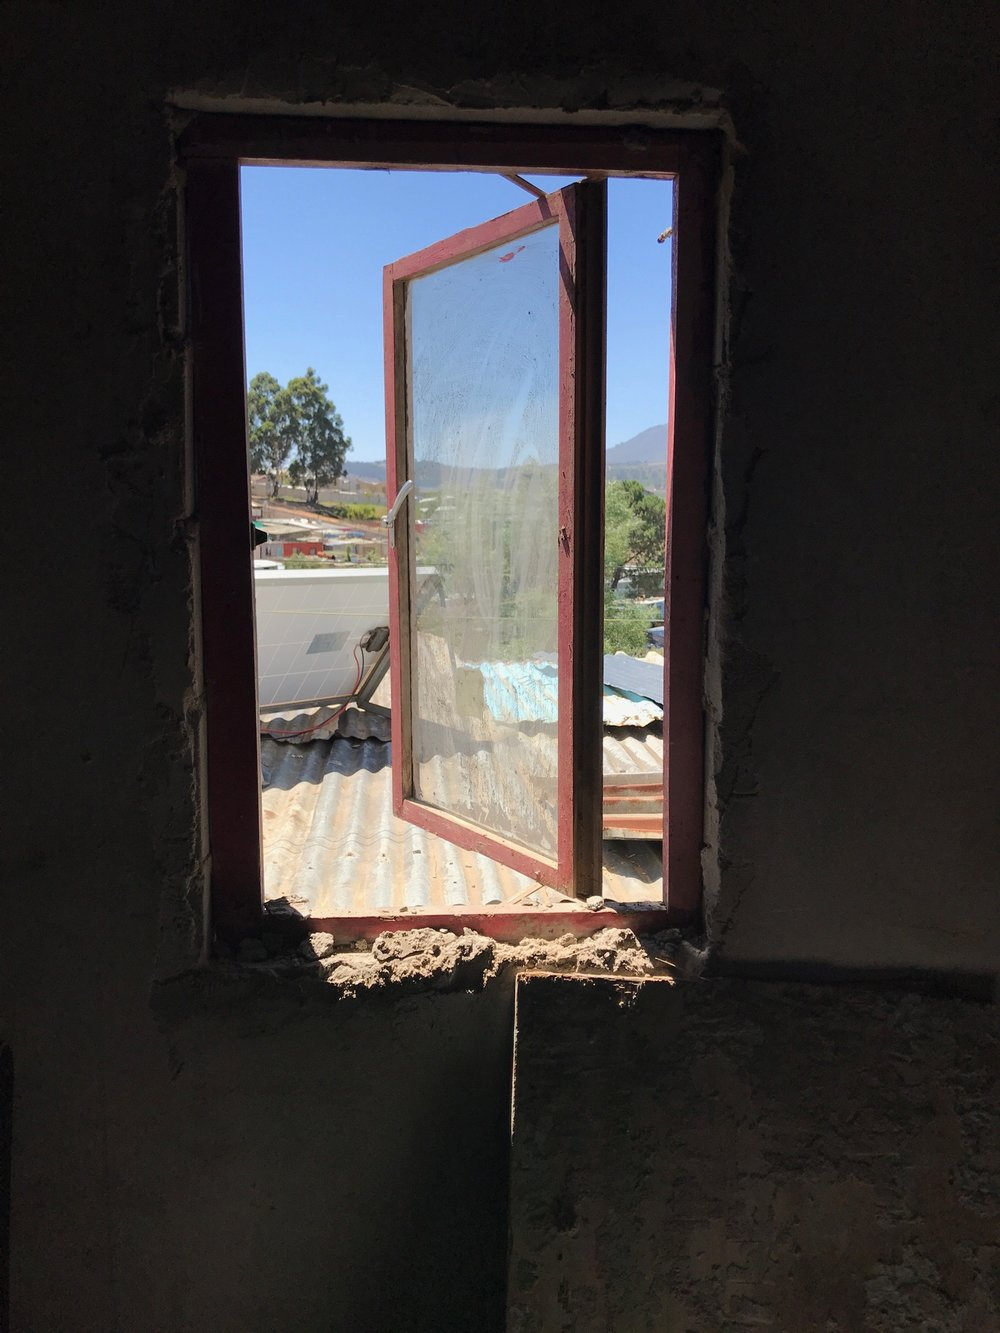 window in kitchen area